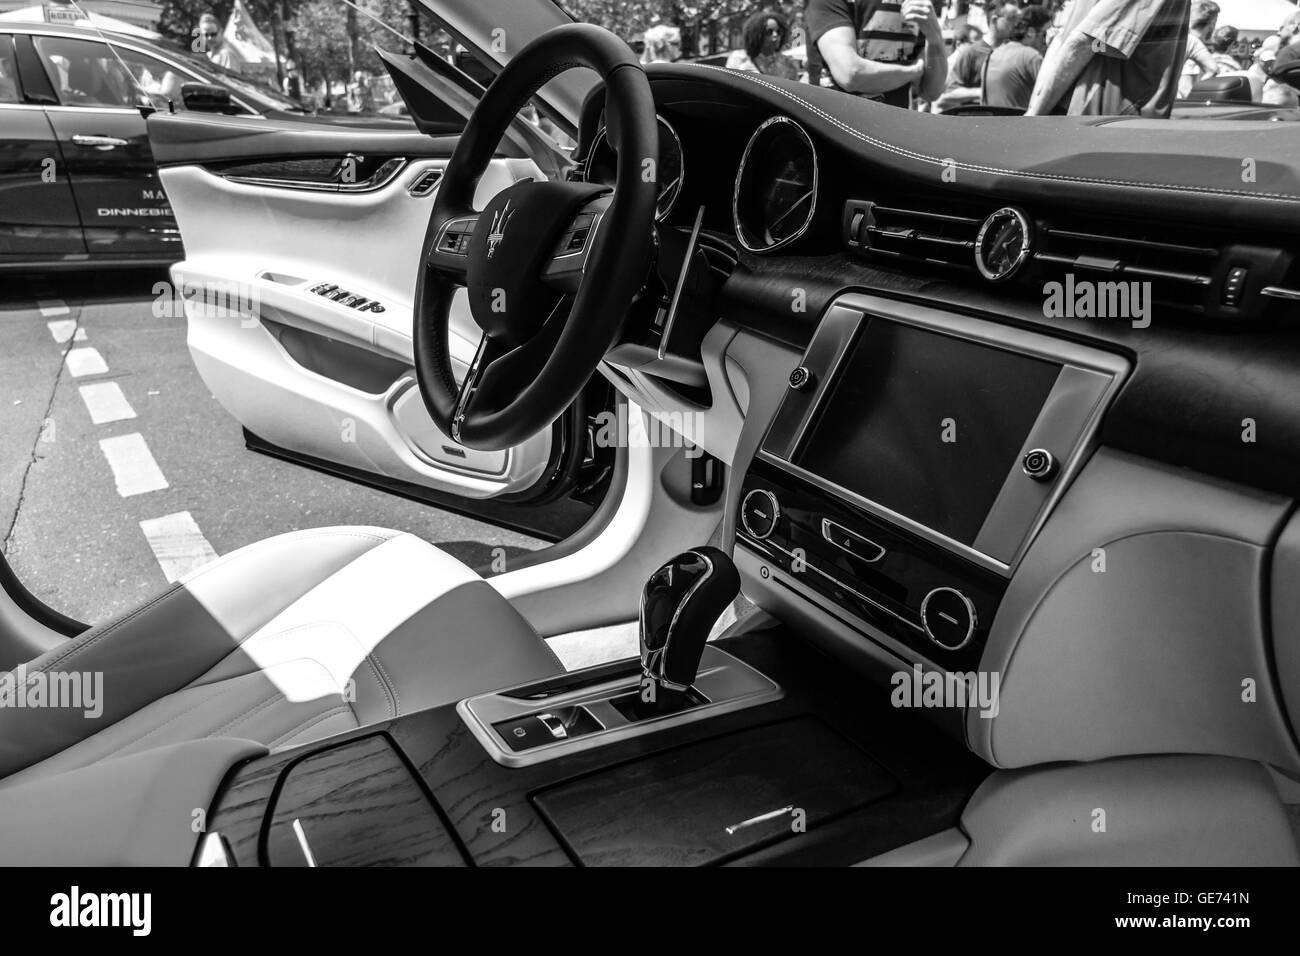 interior of full size luxury car maserati quattroporte vi since stock photo royalty free image. Black Bedroom Furniture Sets. Home Design Ideas